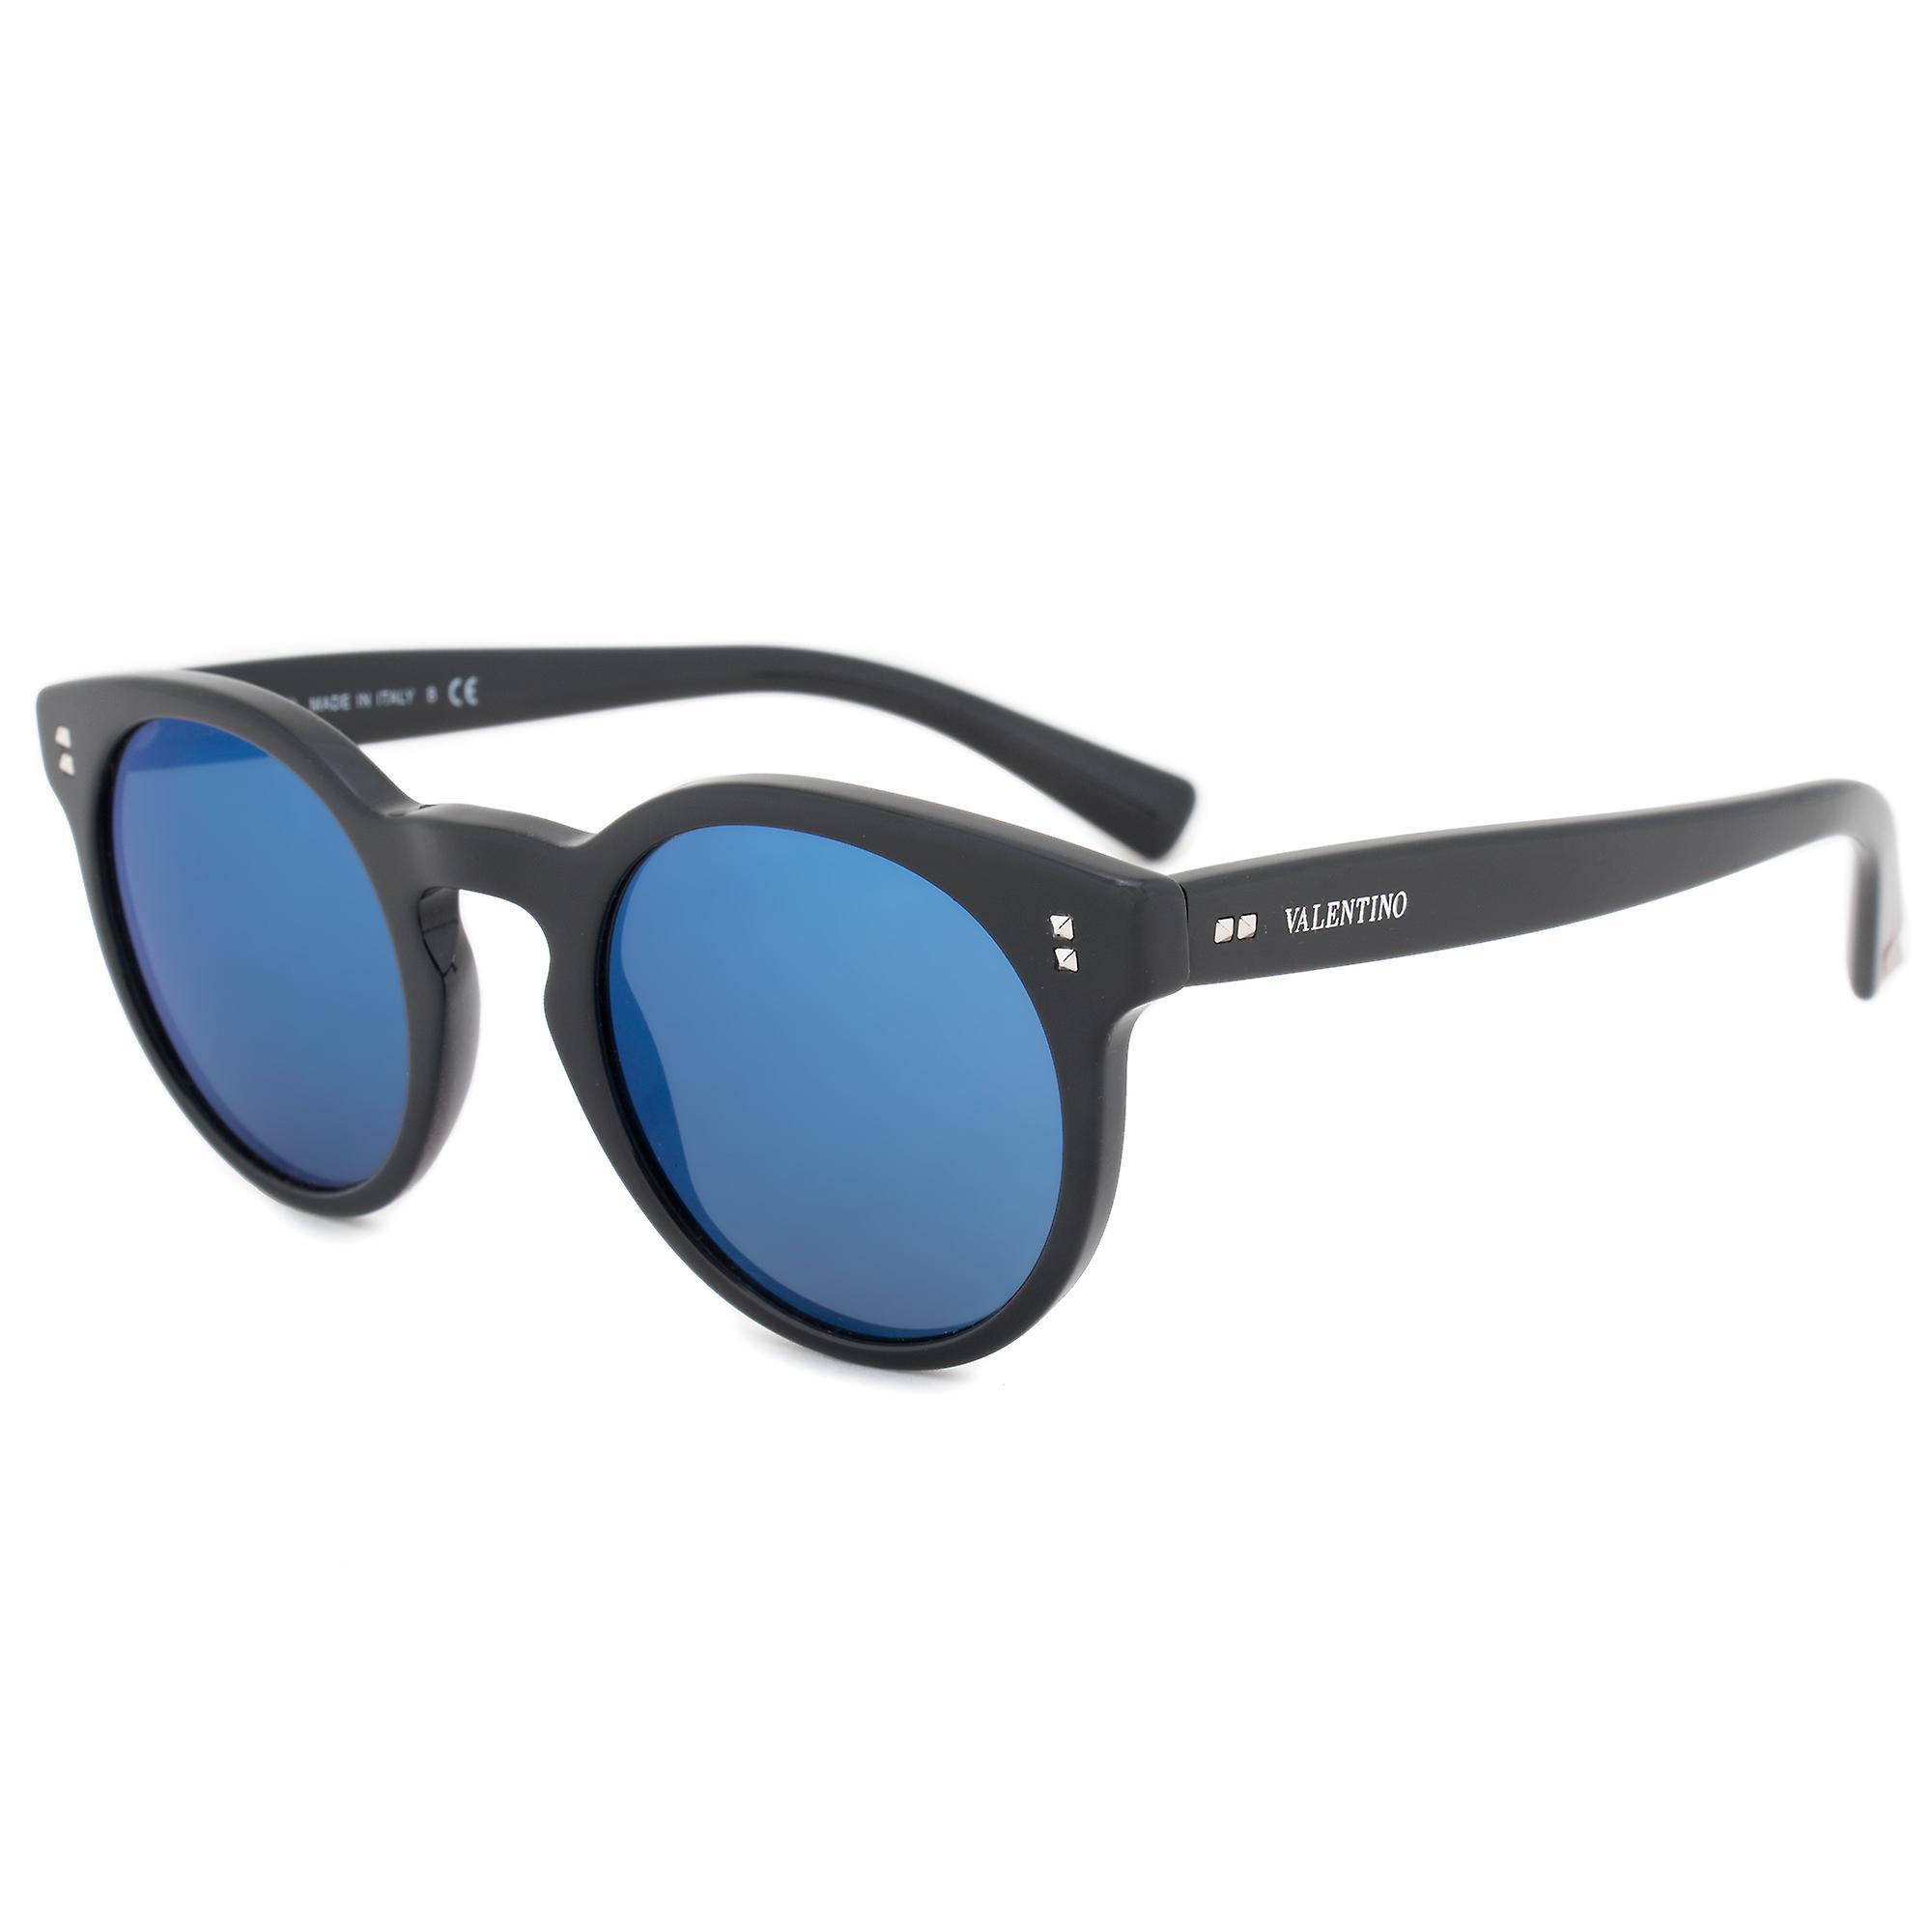 Valentino Round Sunglasses VA4009 500155 47